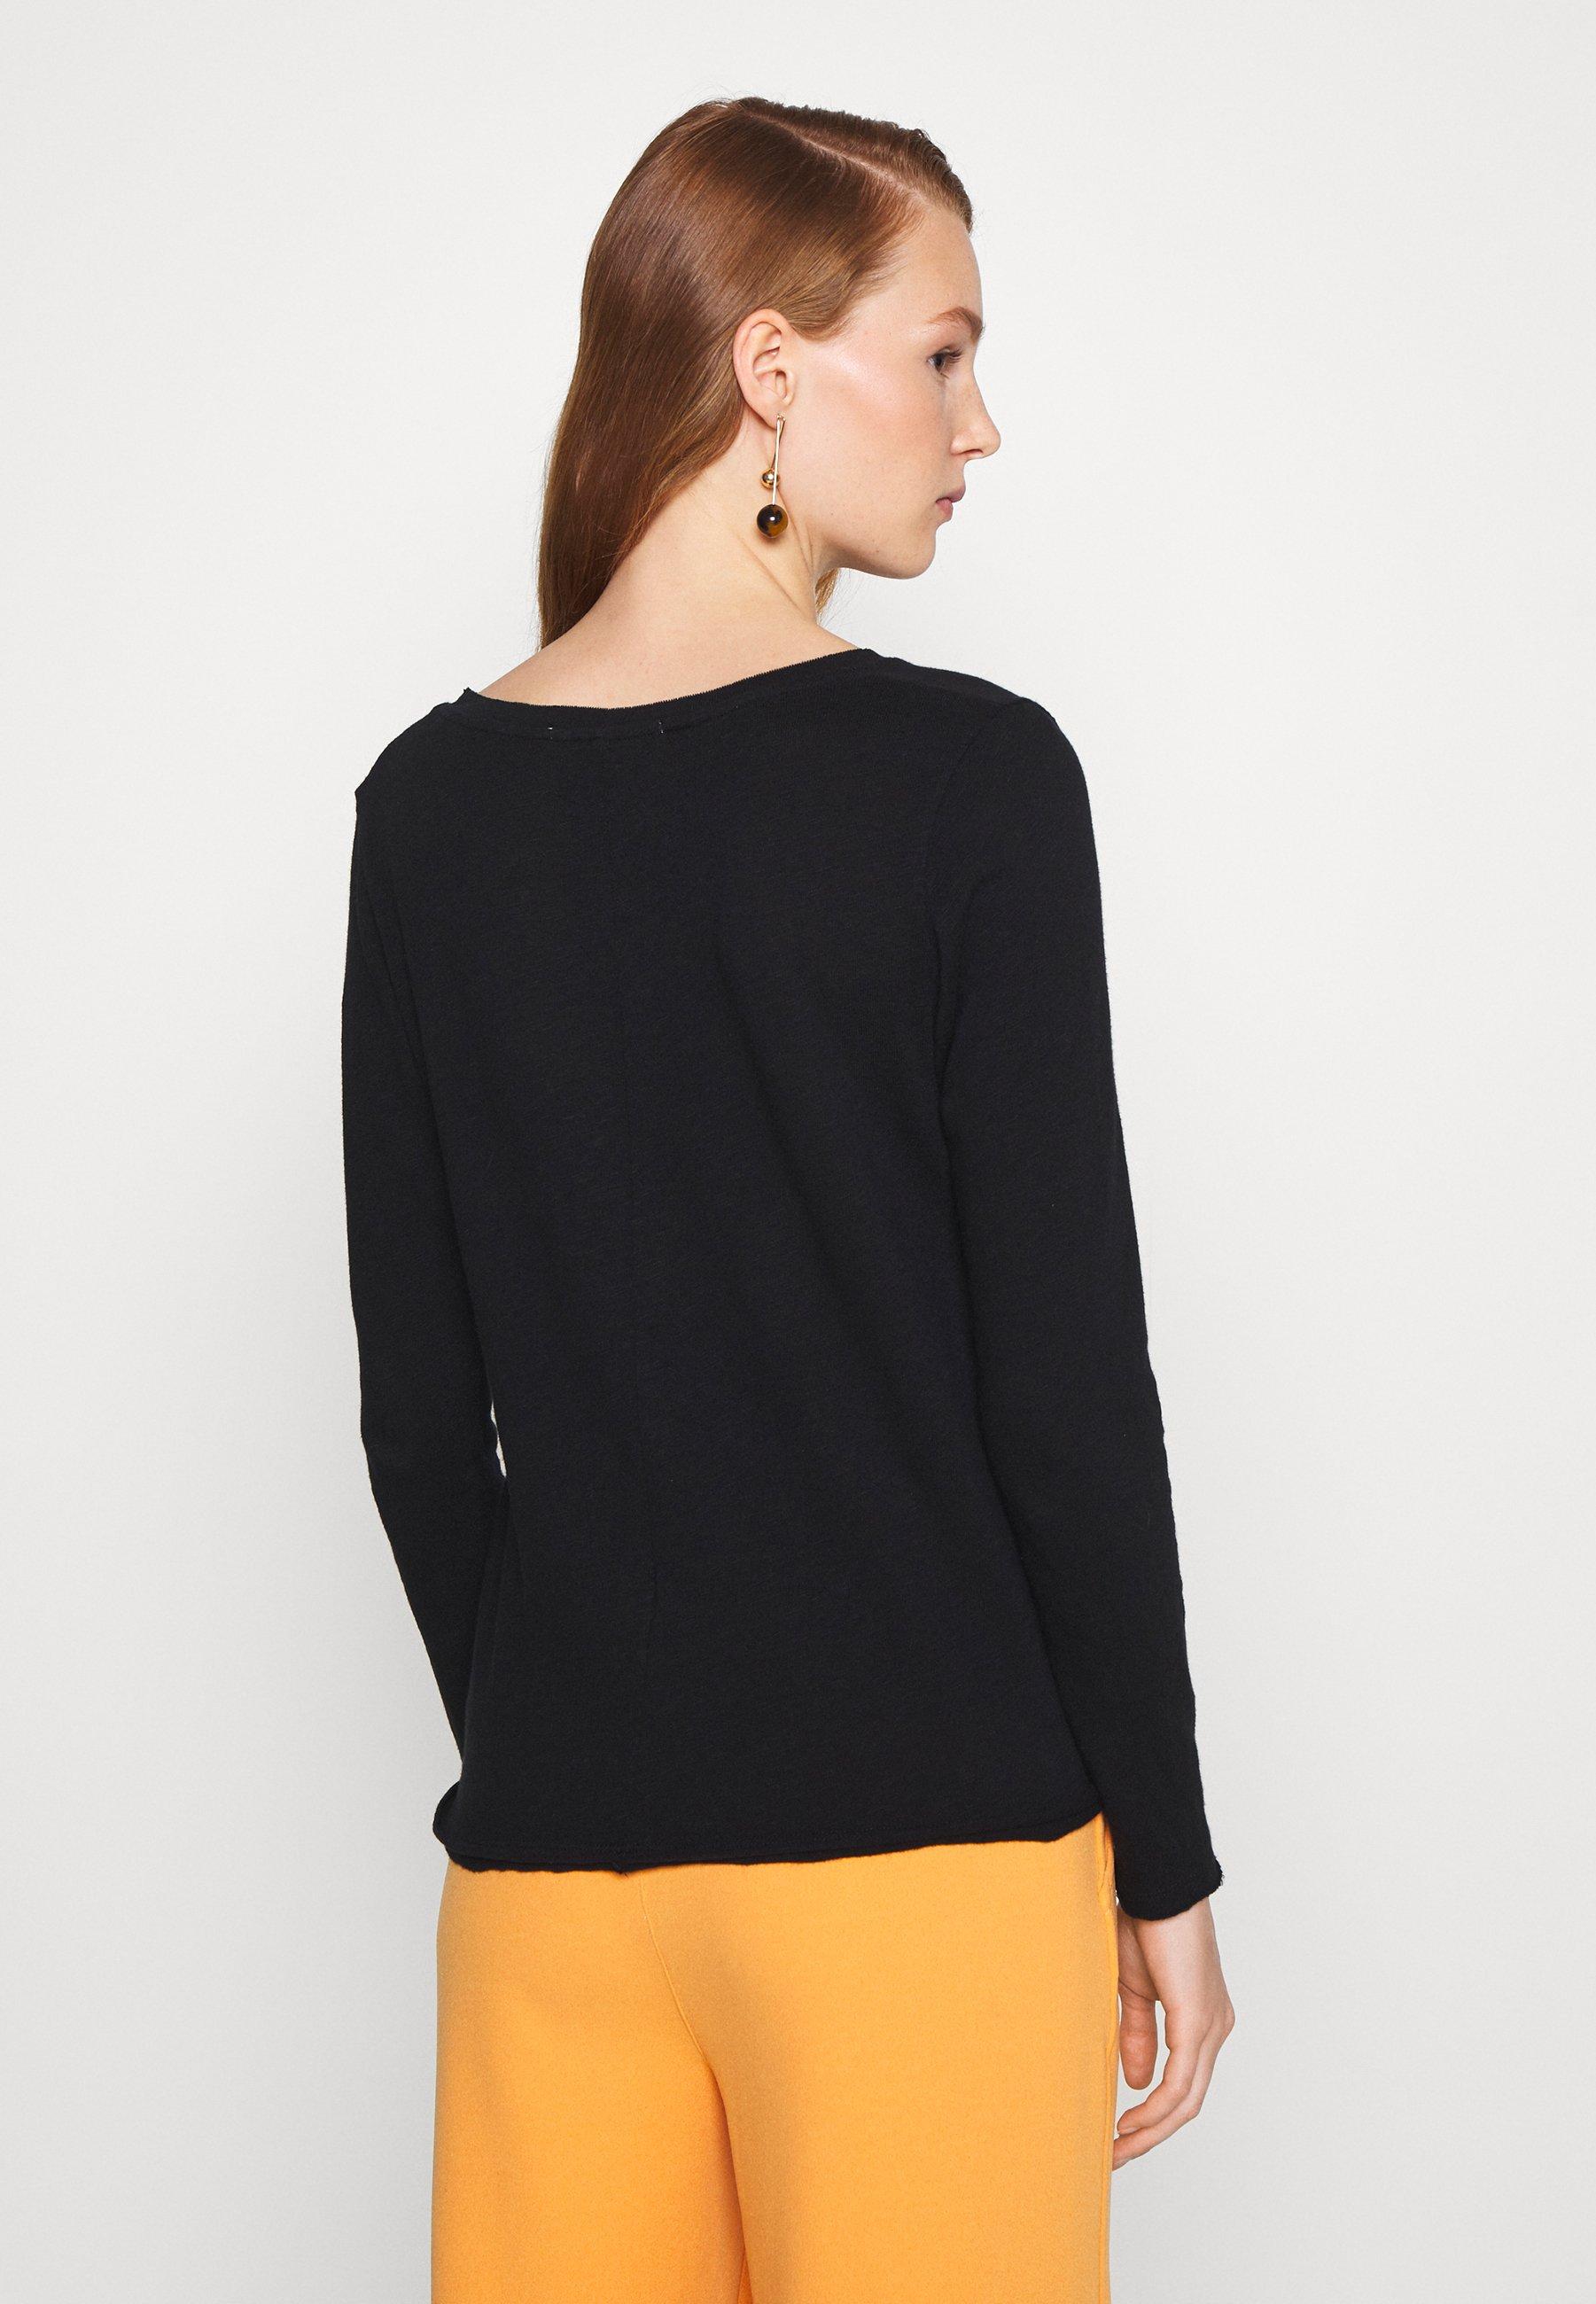 The Cheapest Women's Clothing American Vintage SONOMA Long sleeved top noir GDfkkFKfG